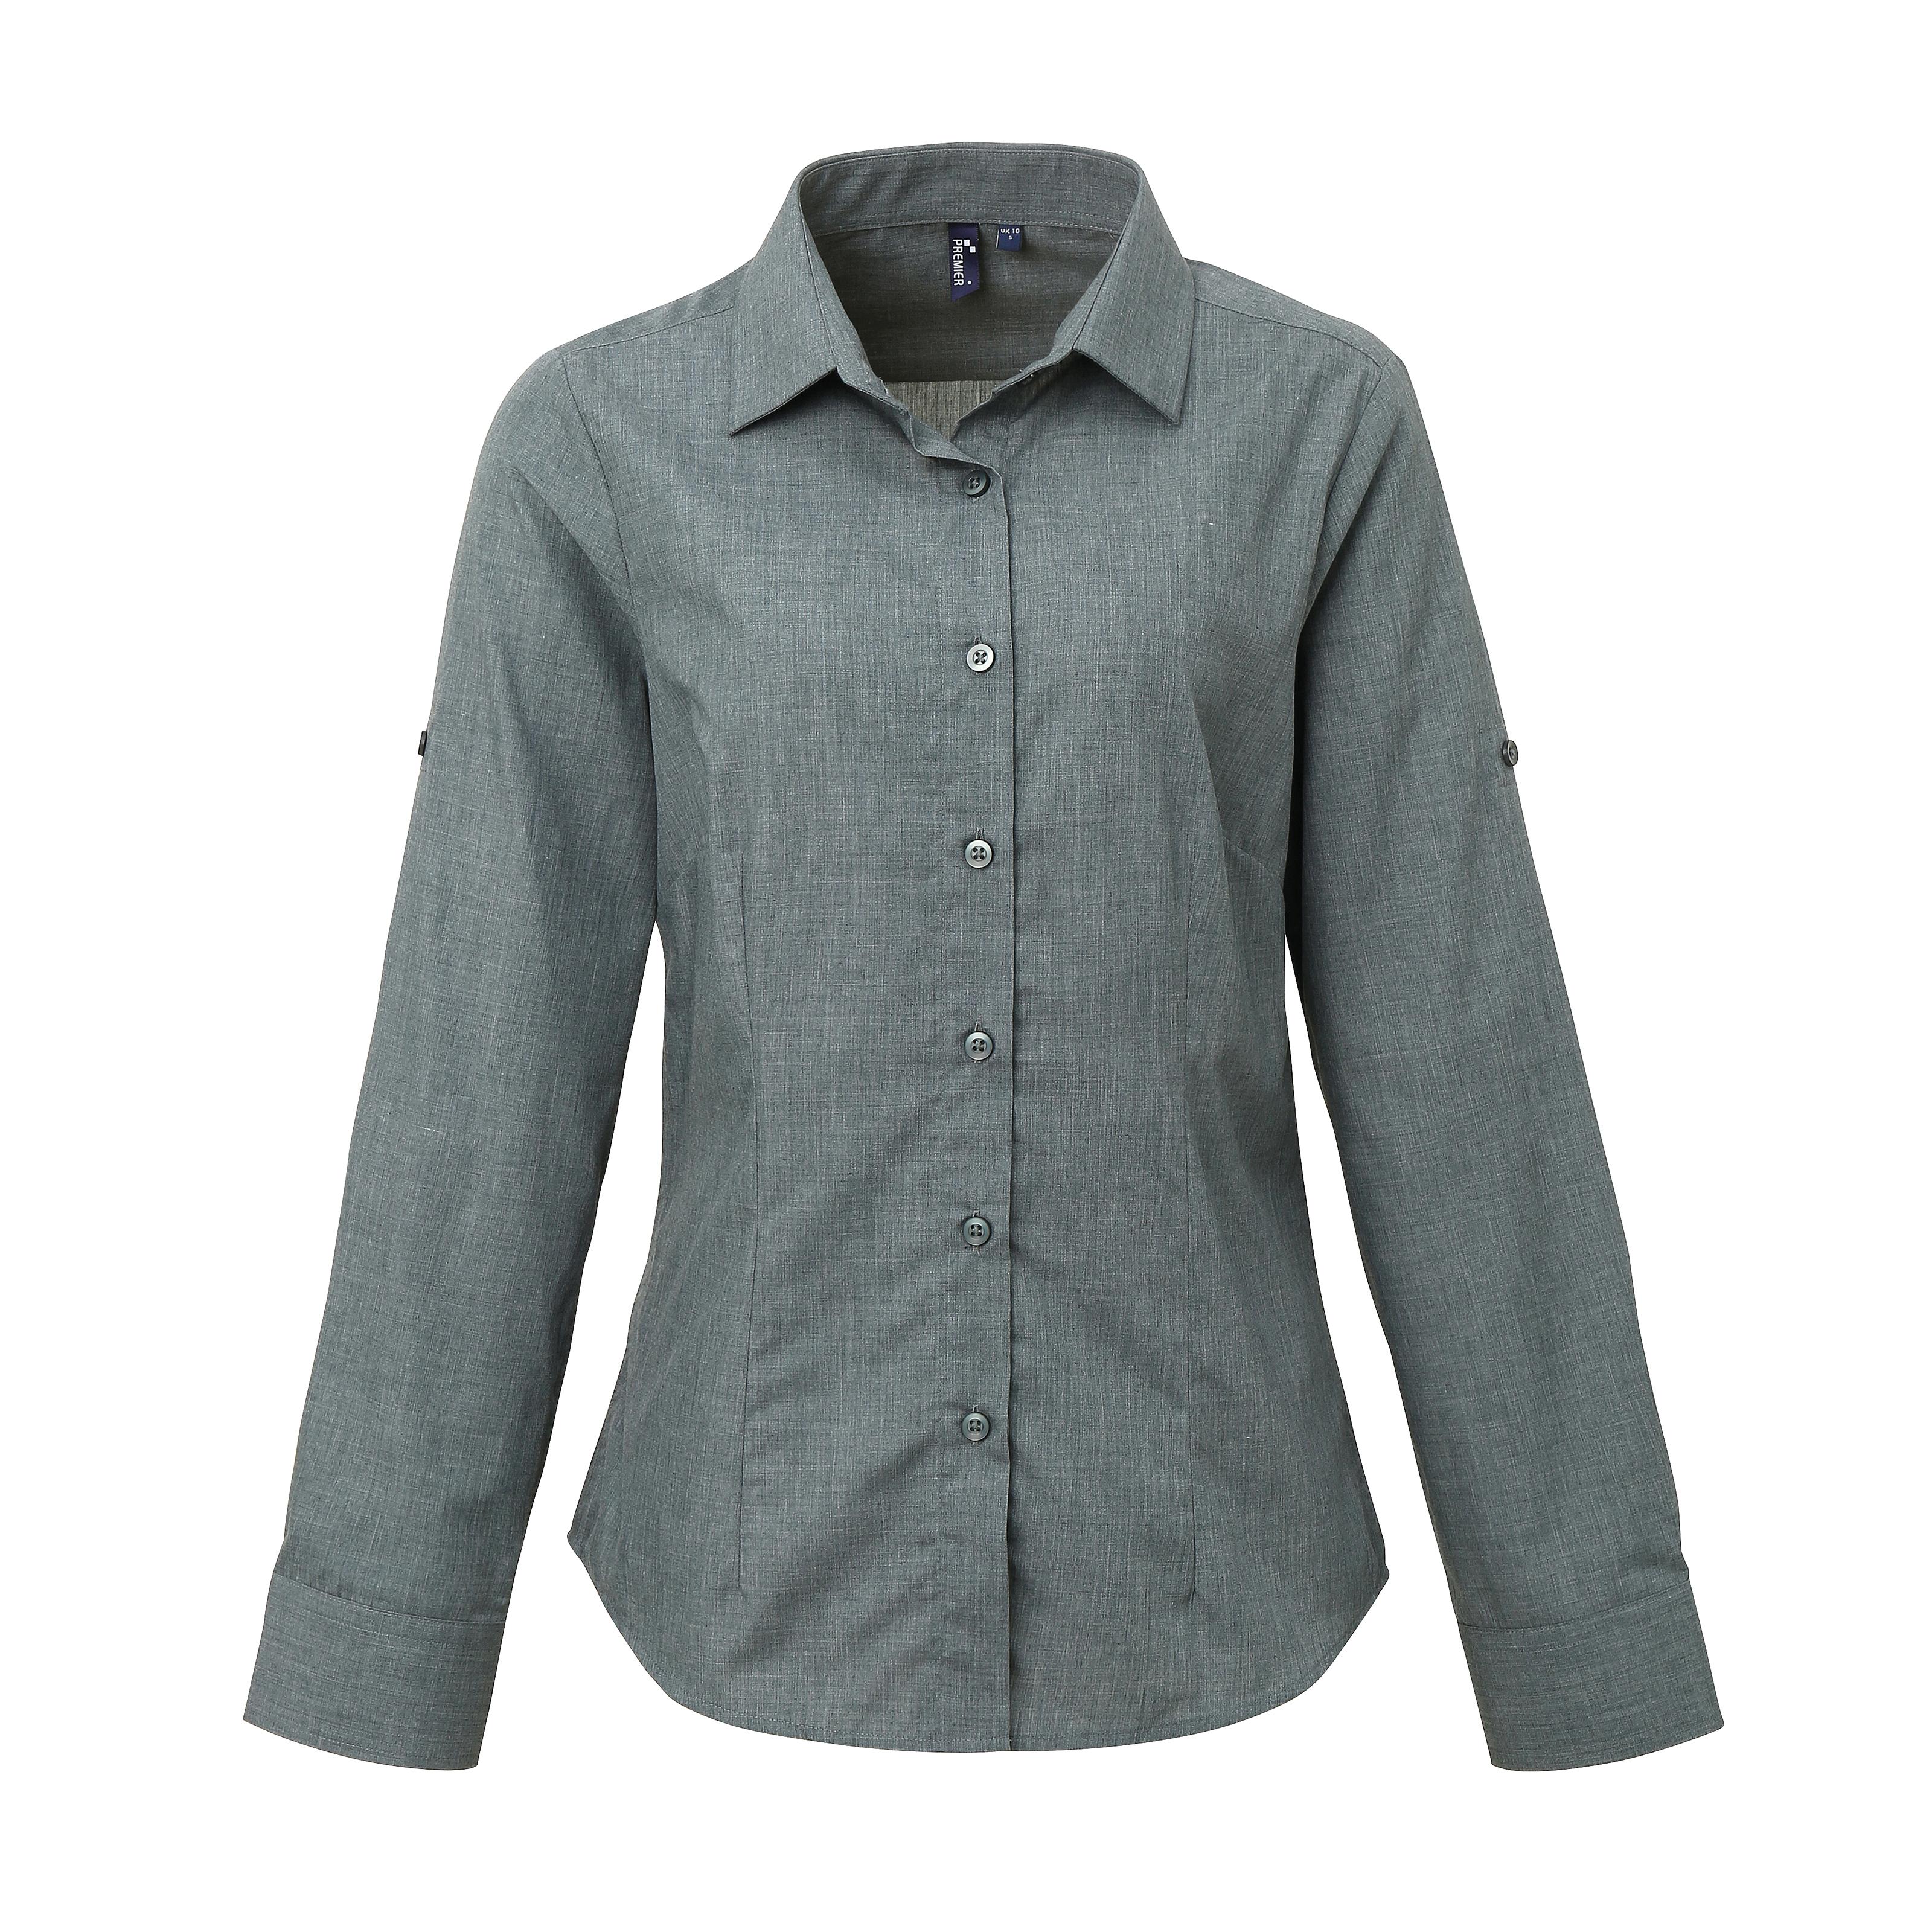 a187a1ffb1 Womens Poplin Cross-Dye Roll Sleeve Shirt (Premier)